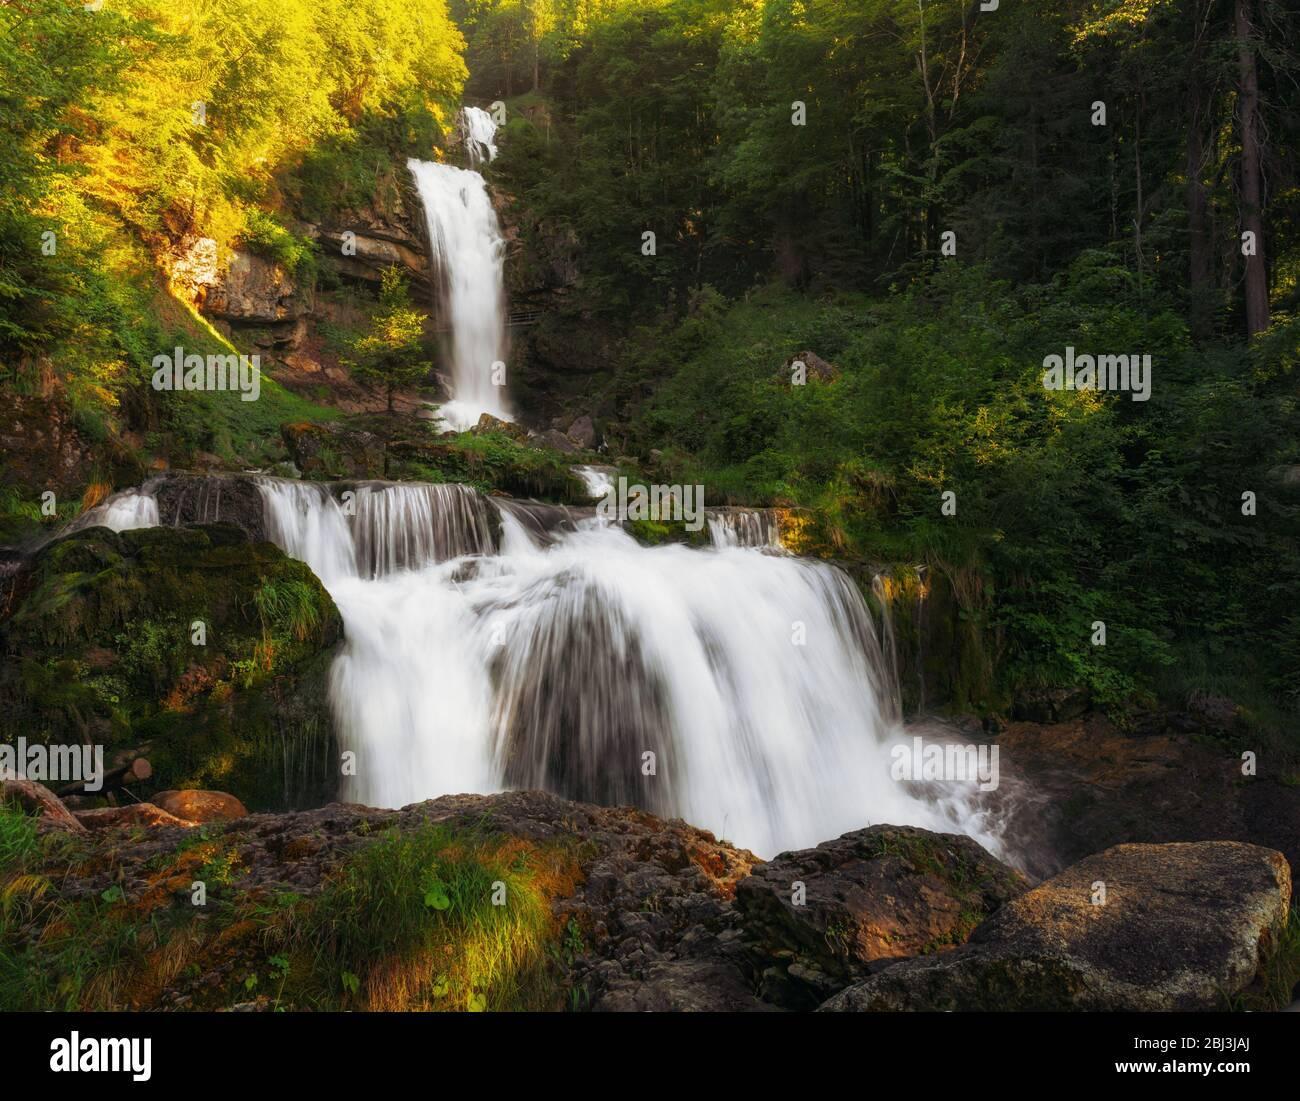 View of Giessbach Waterfall at sunset - Brienzersee, Switzerland Stock Photo